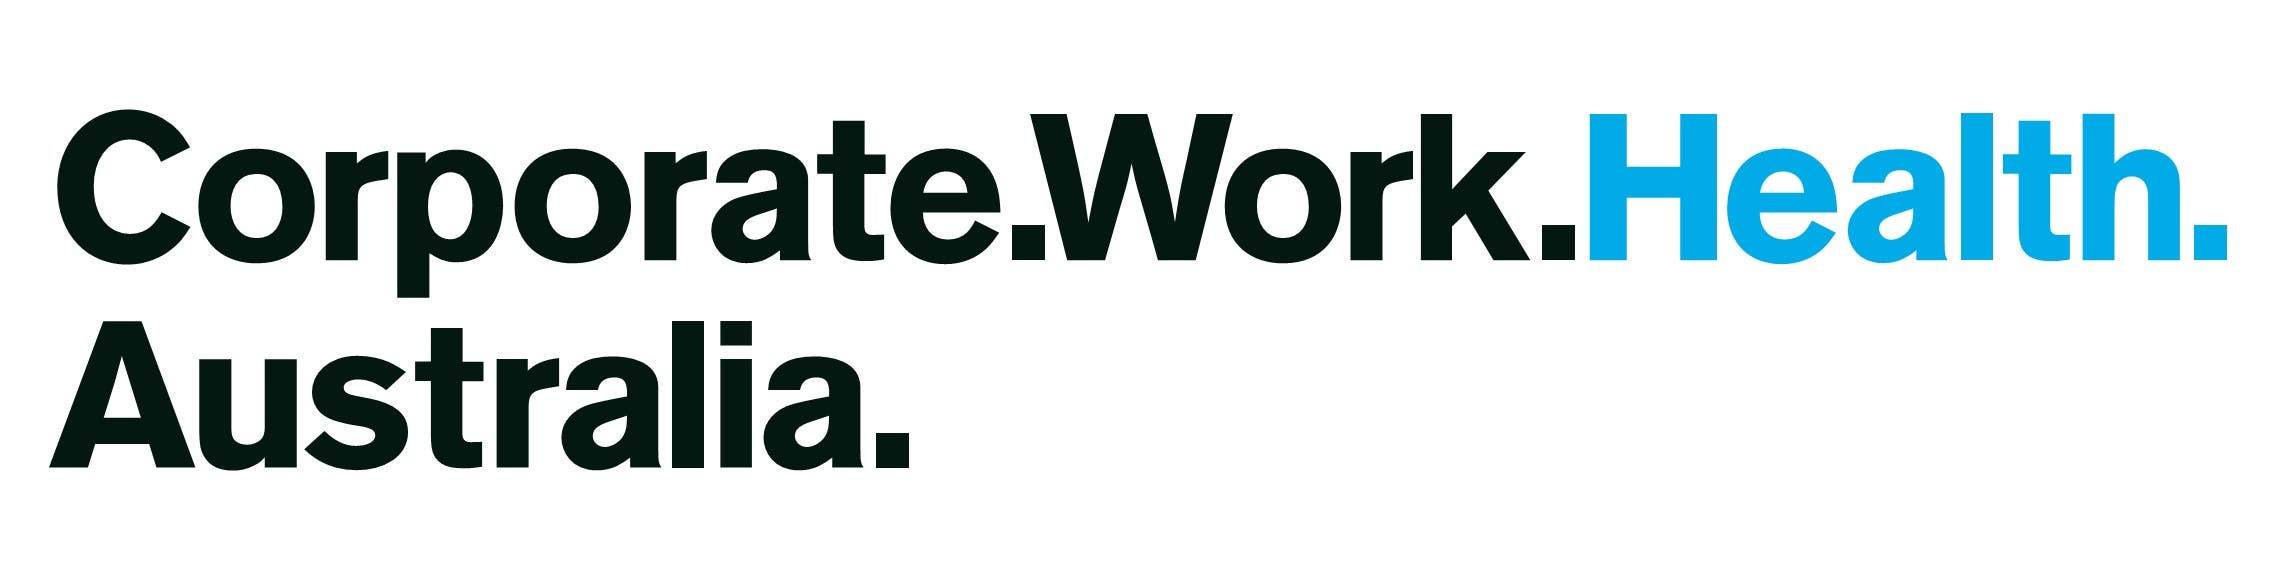 Corporate Work Health Australia